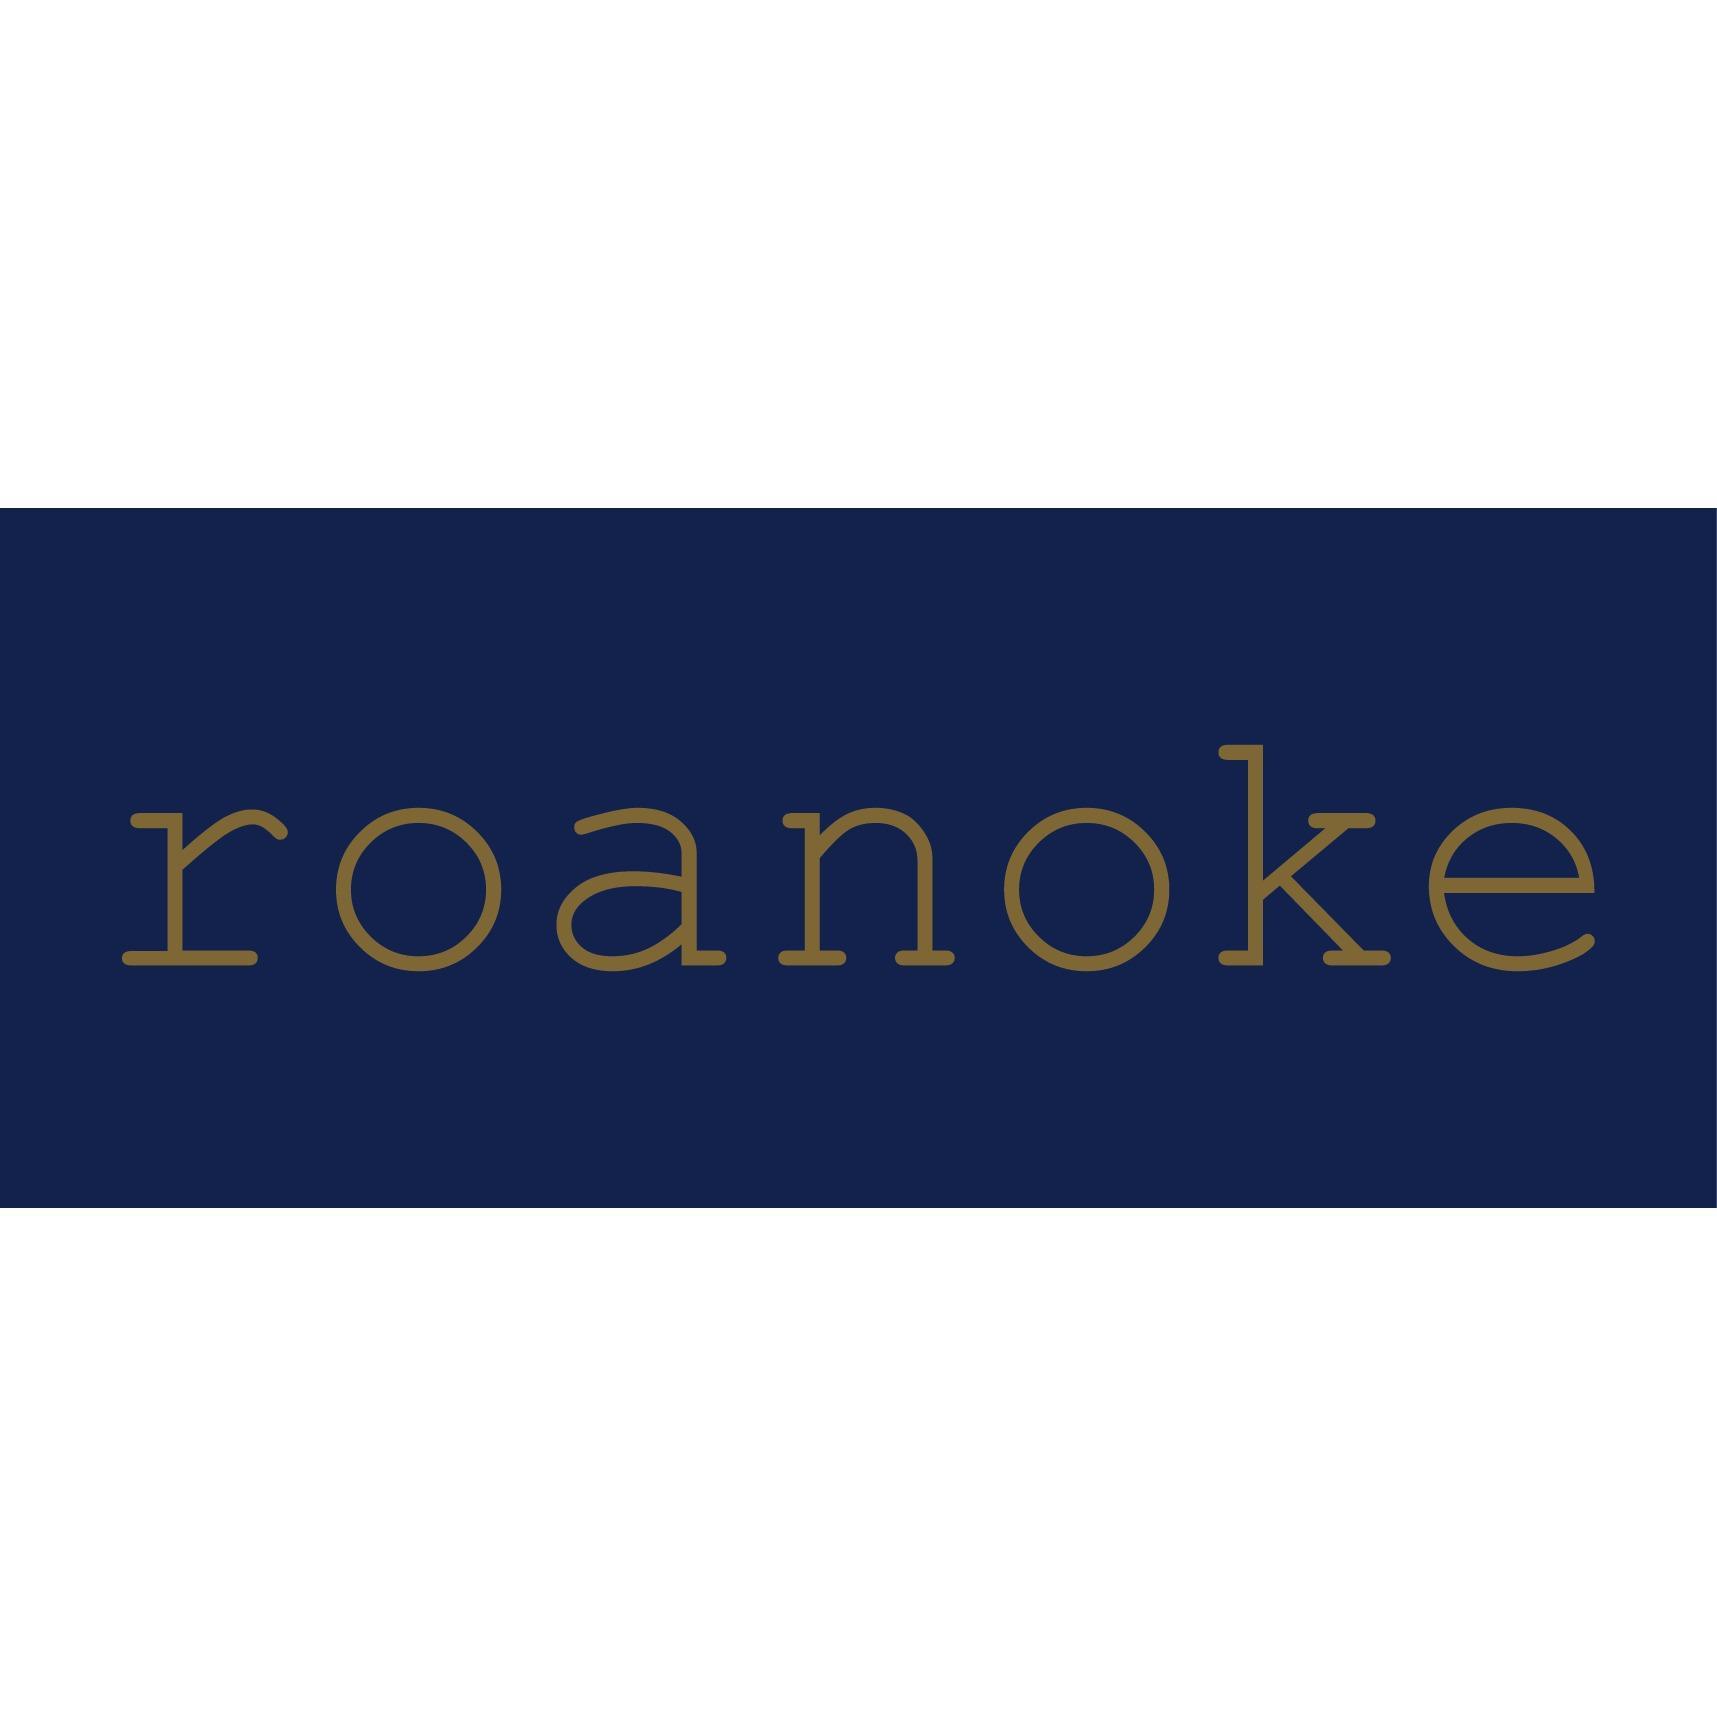 Roanoke Restaurant In Chicago Il 60602